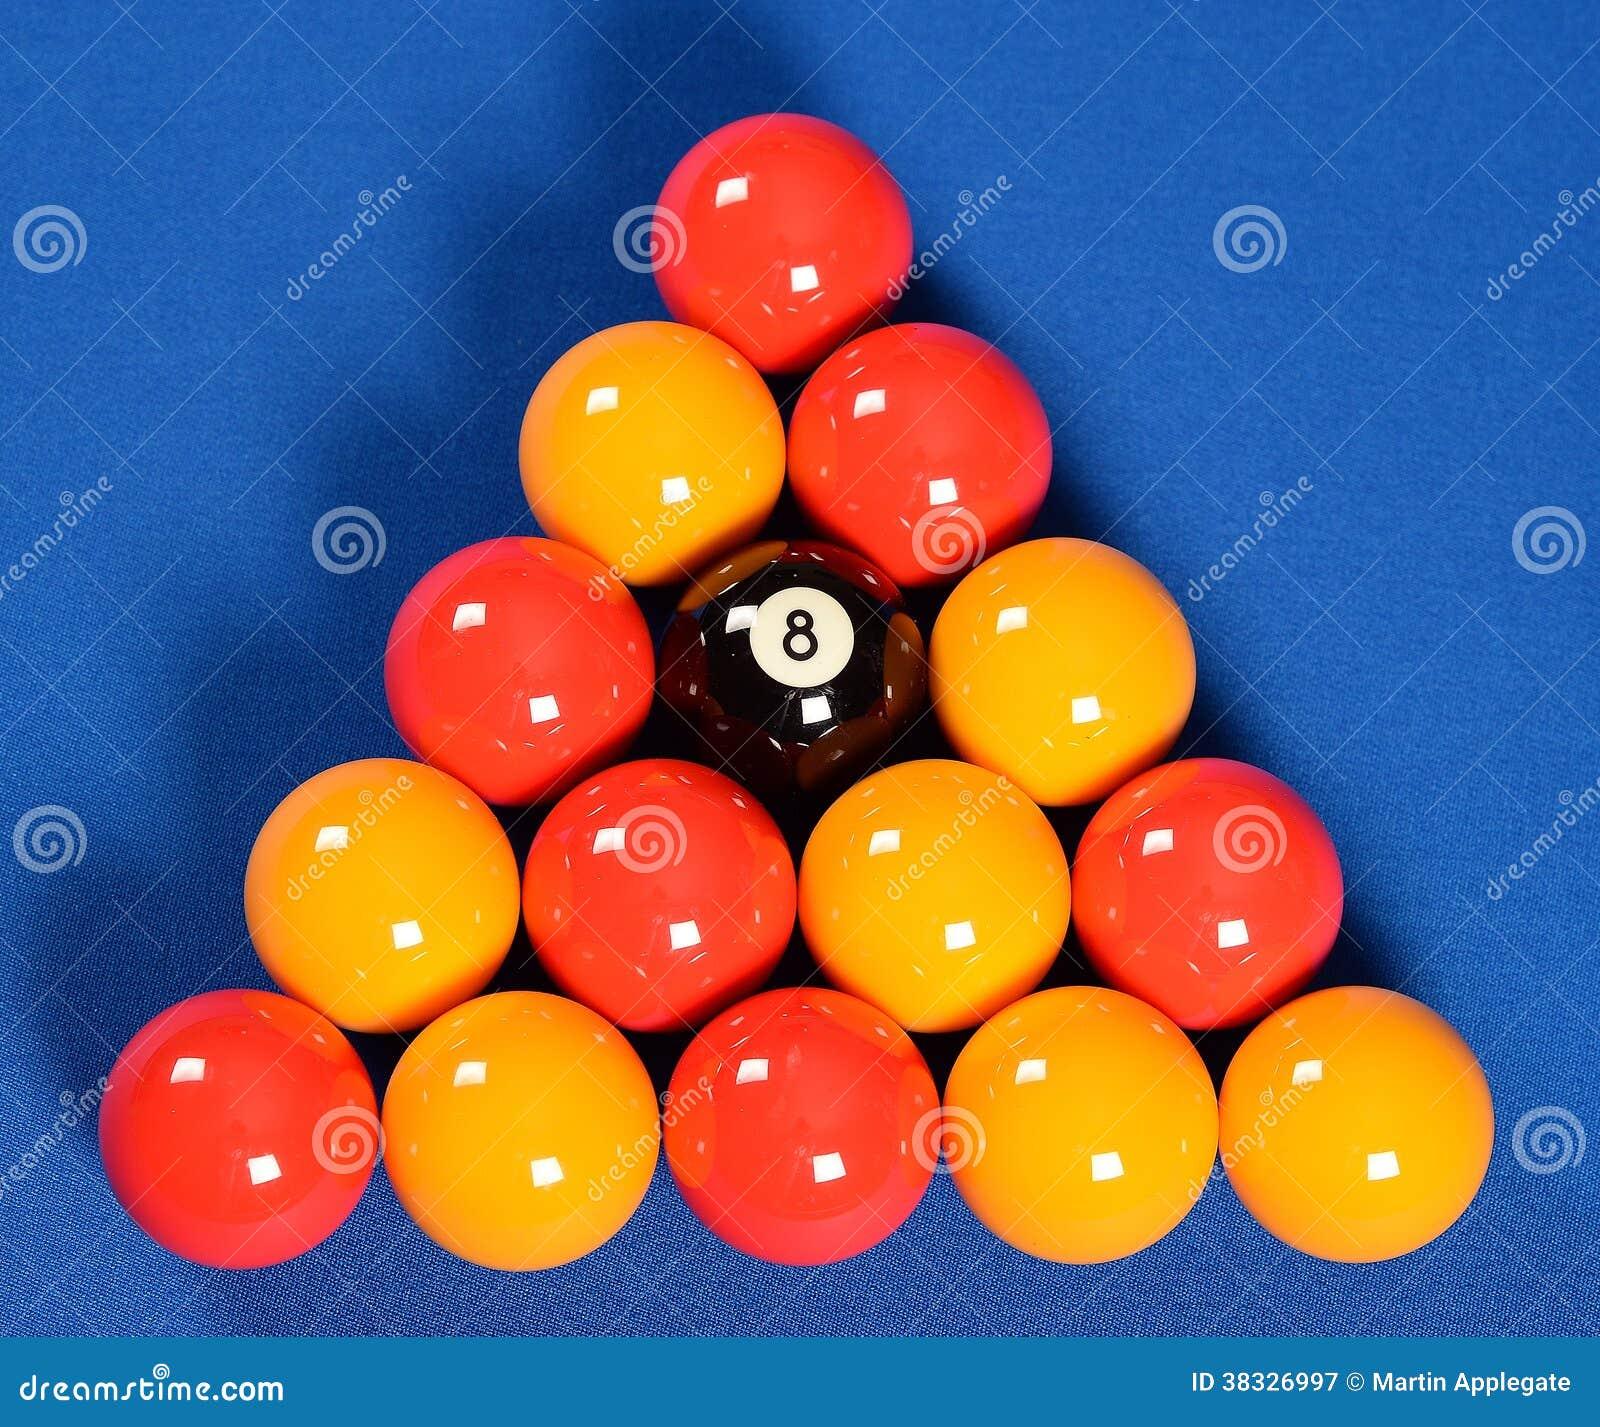 Pool Balls Royalty Free Stock Photography - Image: 38326997